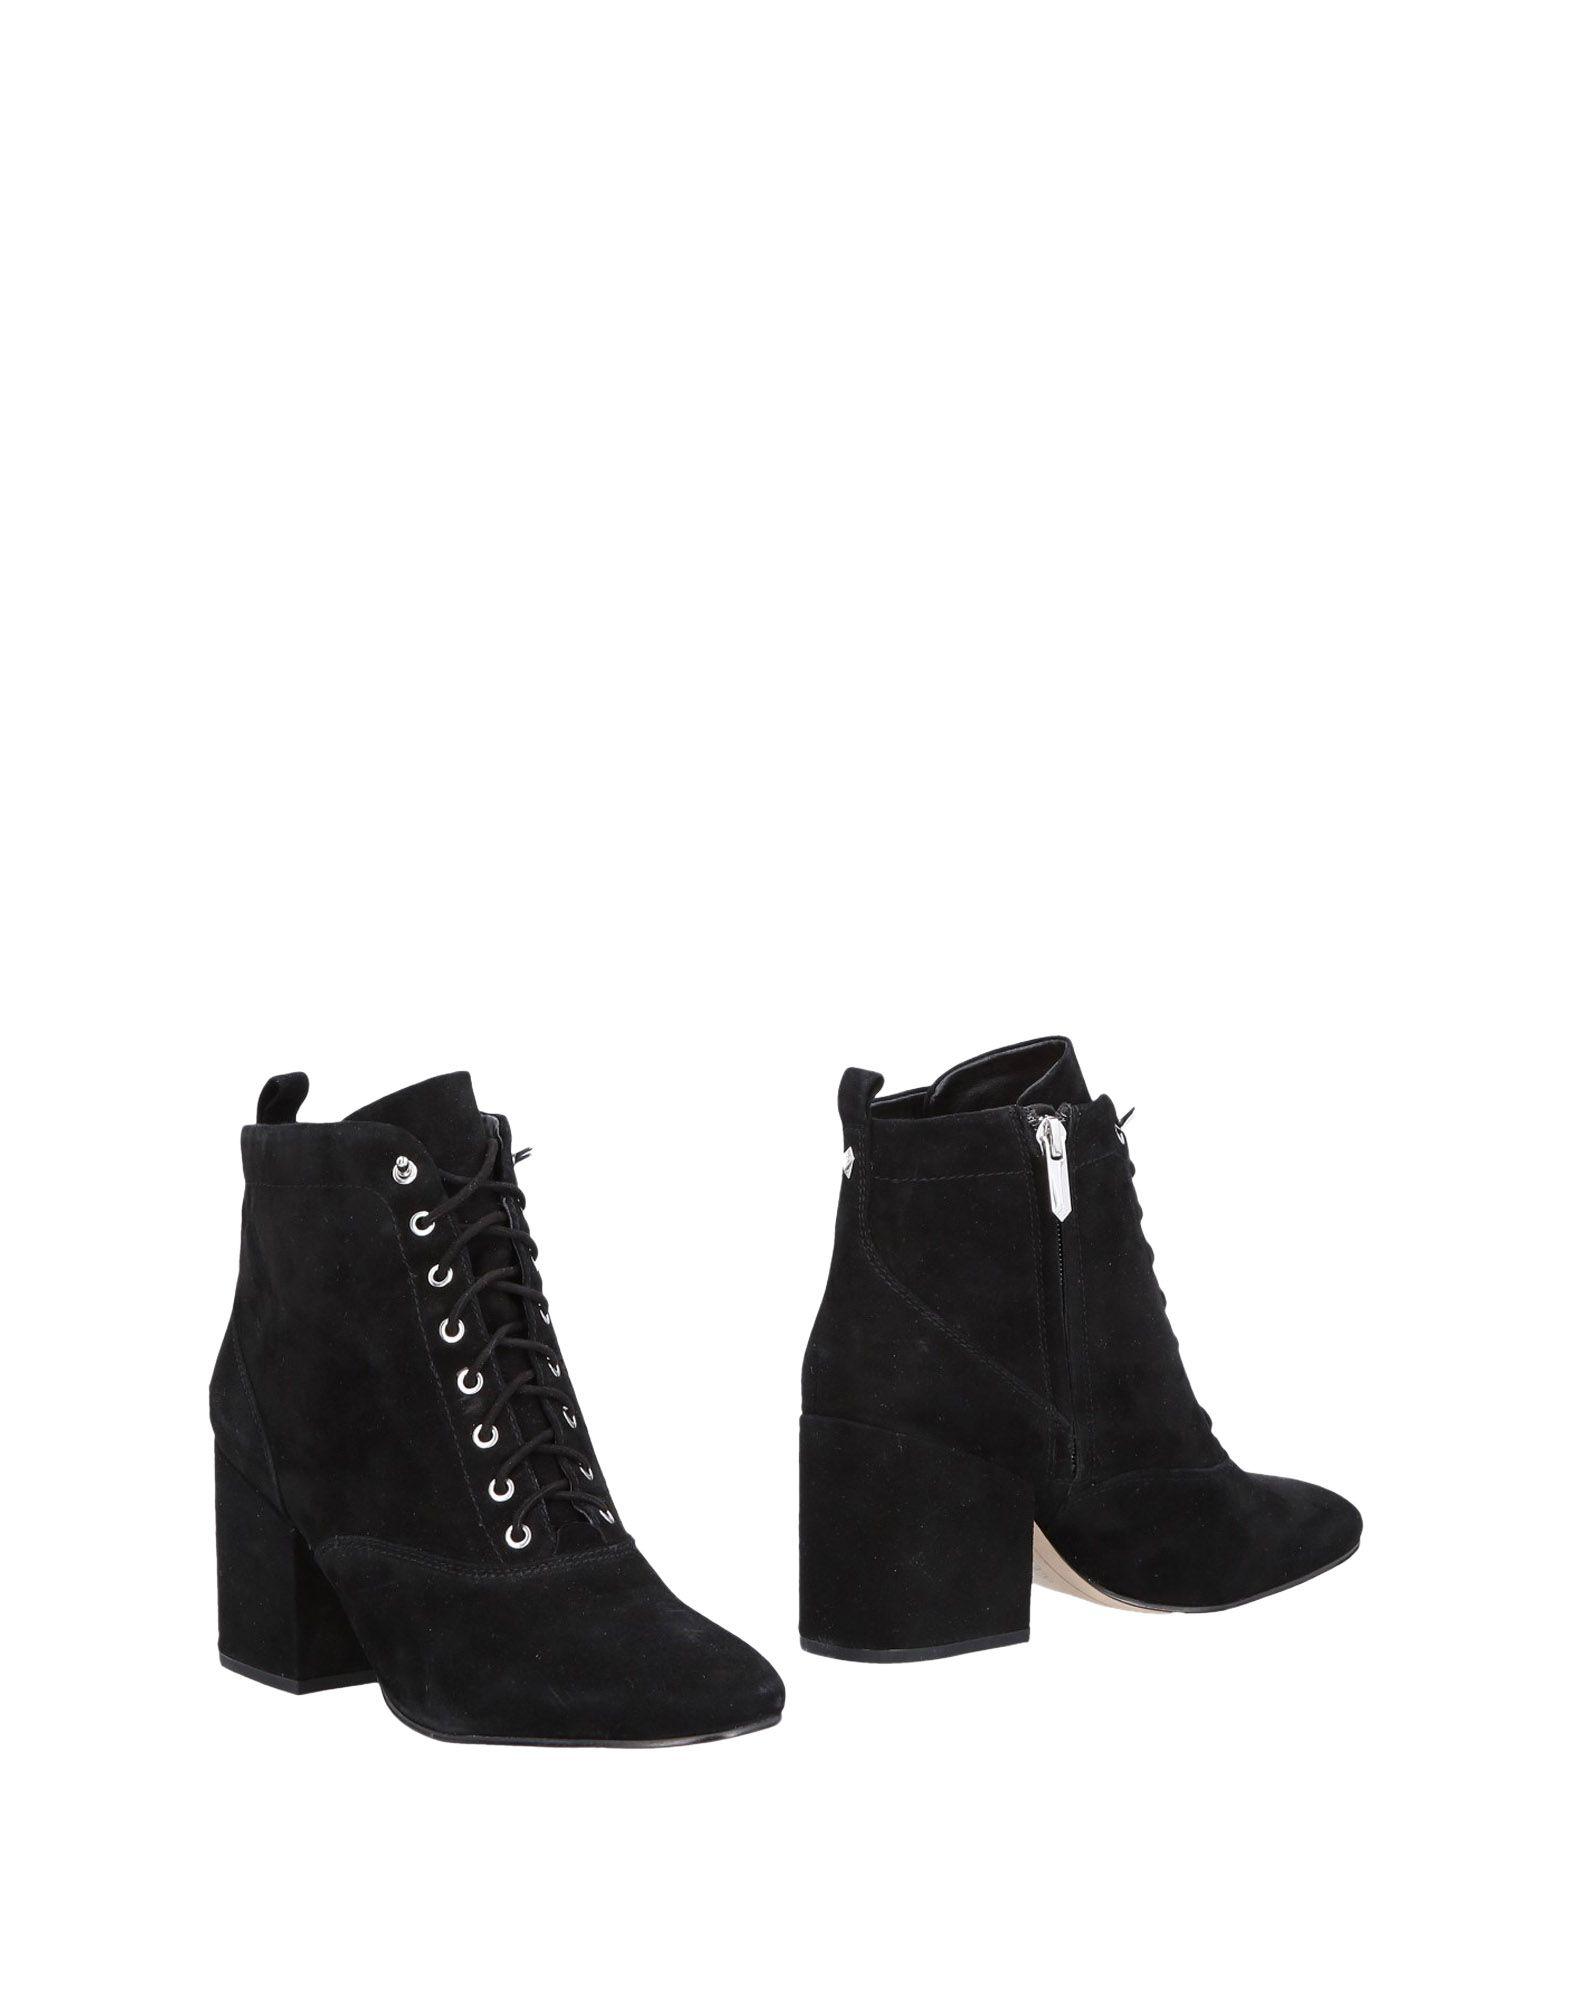 Sam Edelman Gute Stiefelette Damen  11471444KE Gute Edelman Qualität beliebte Schuhe c661e7